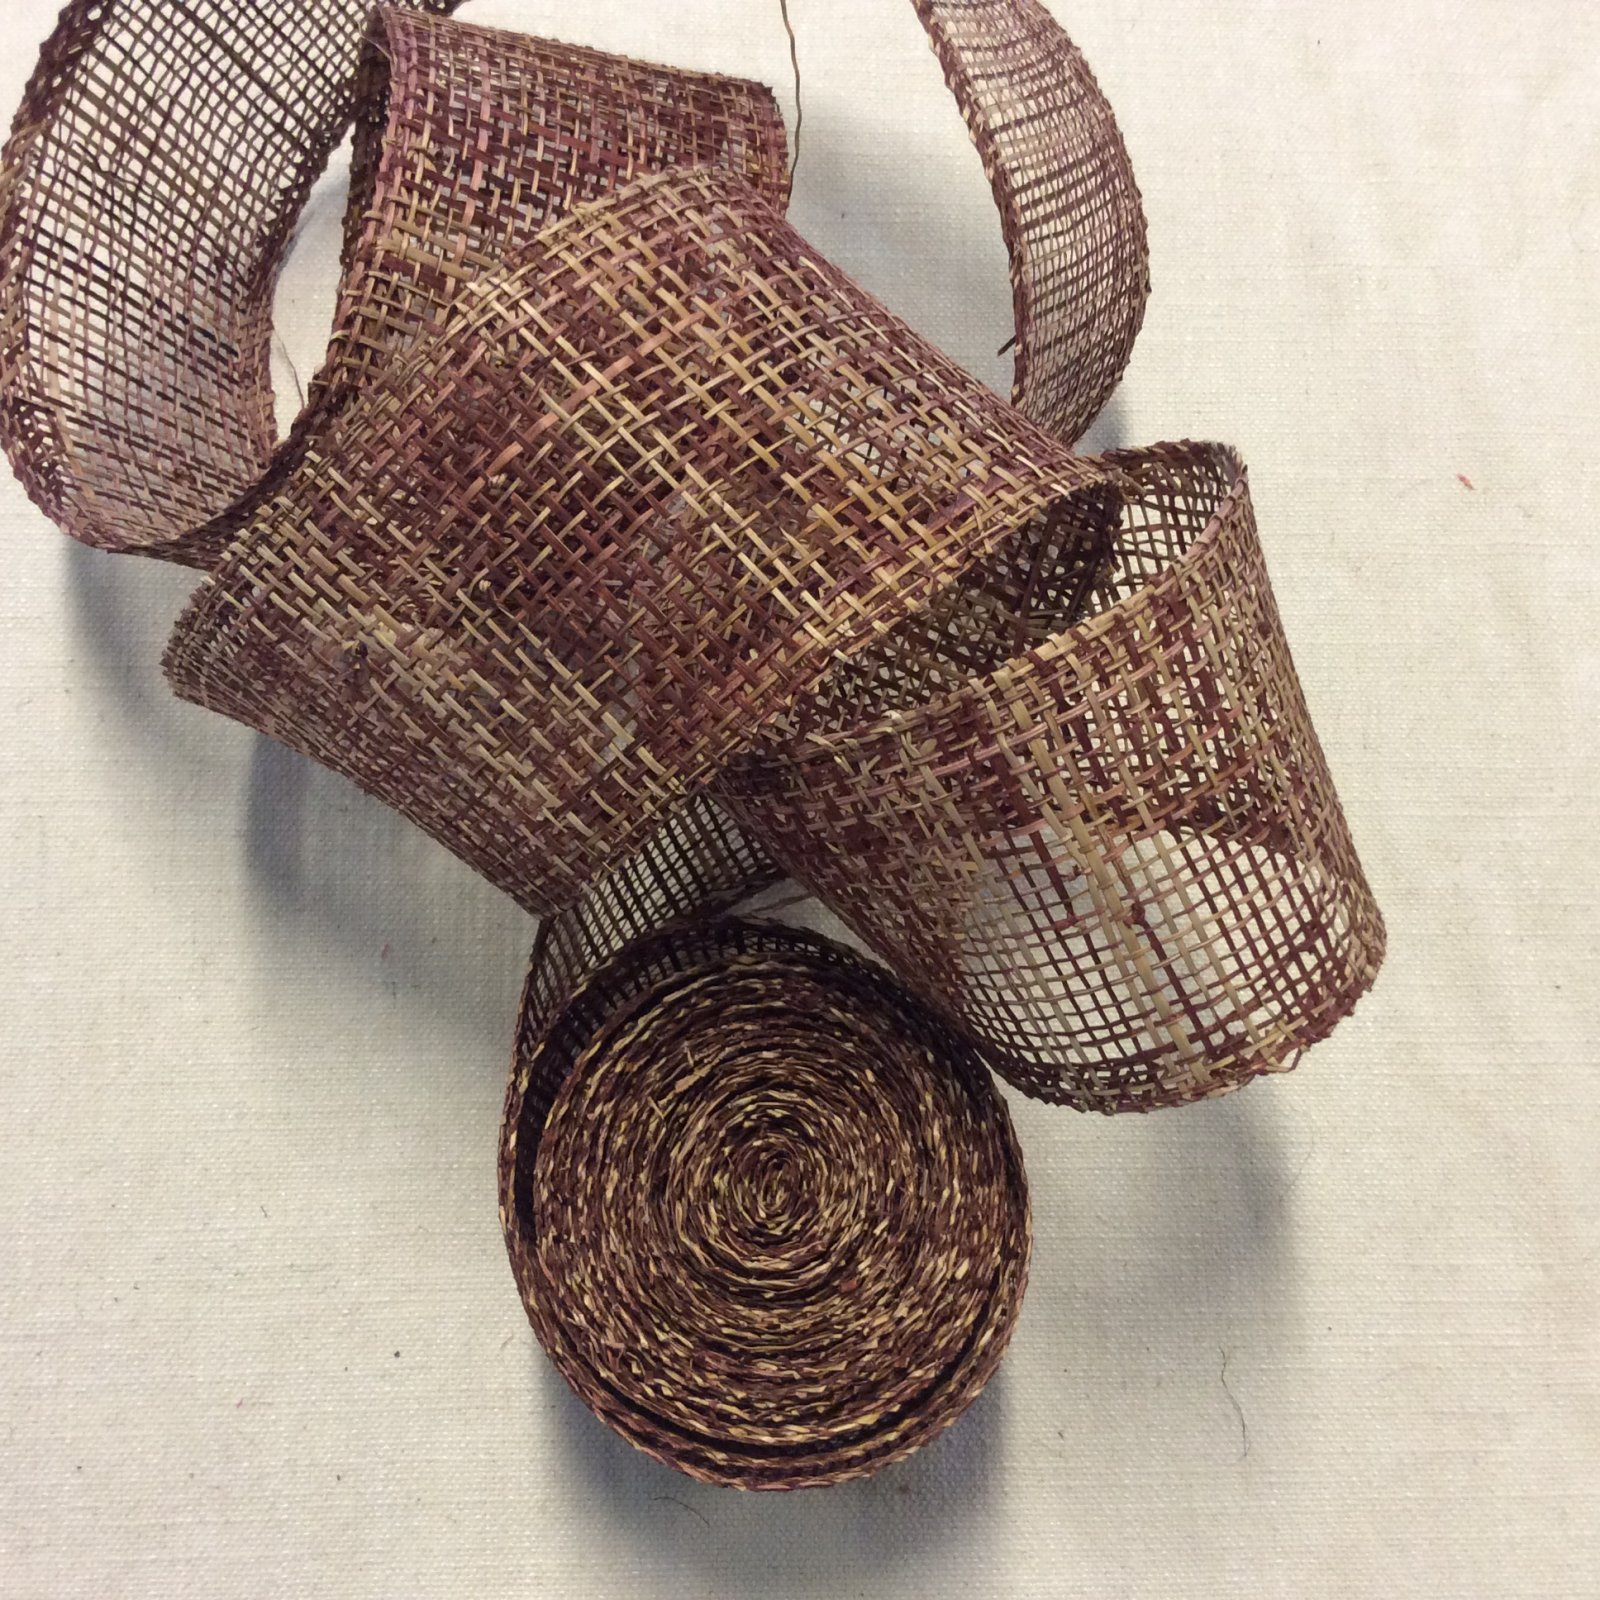 3 Yard Piece! Natural Woven Paper Like Ribbon 4 Brown Tone Trim RIB1296